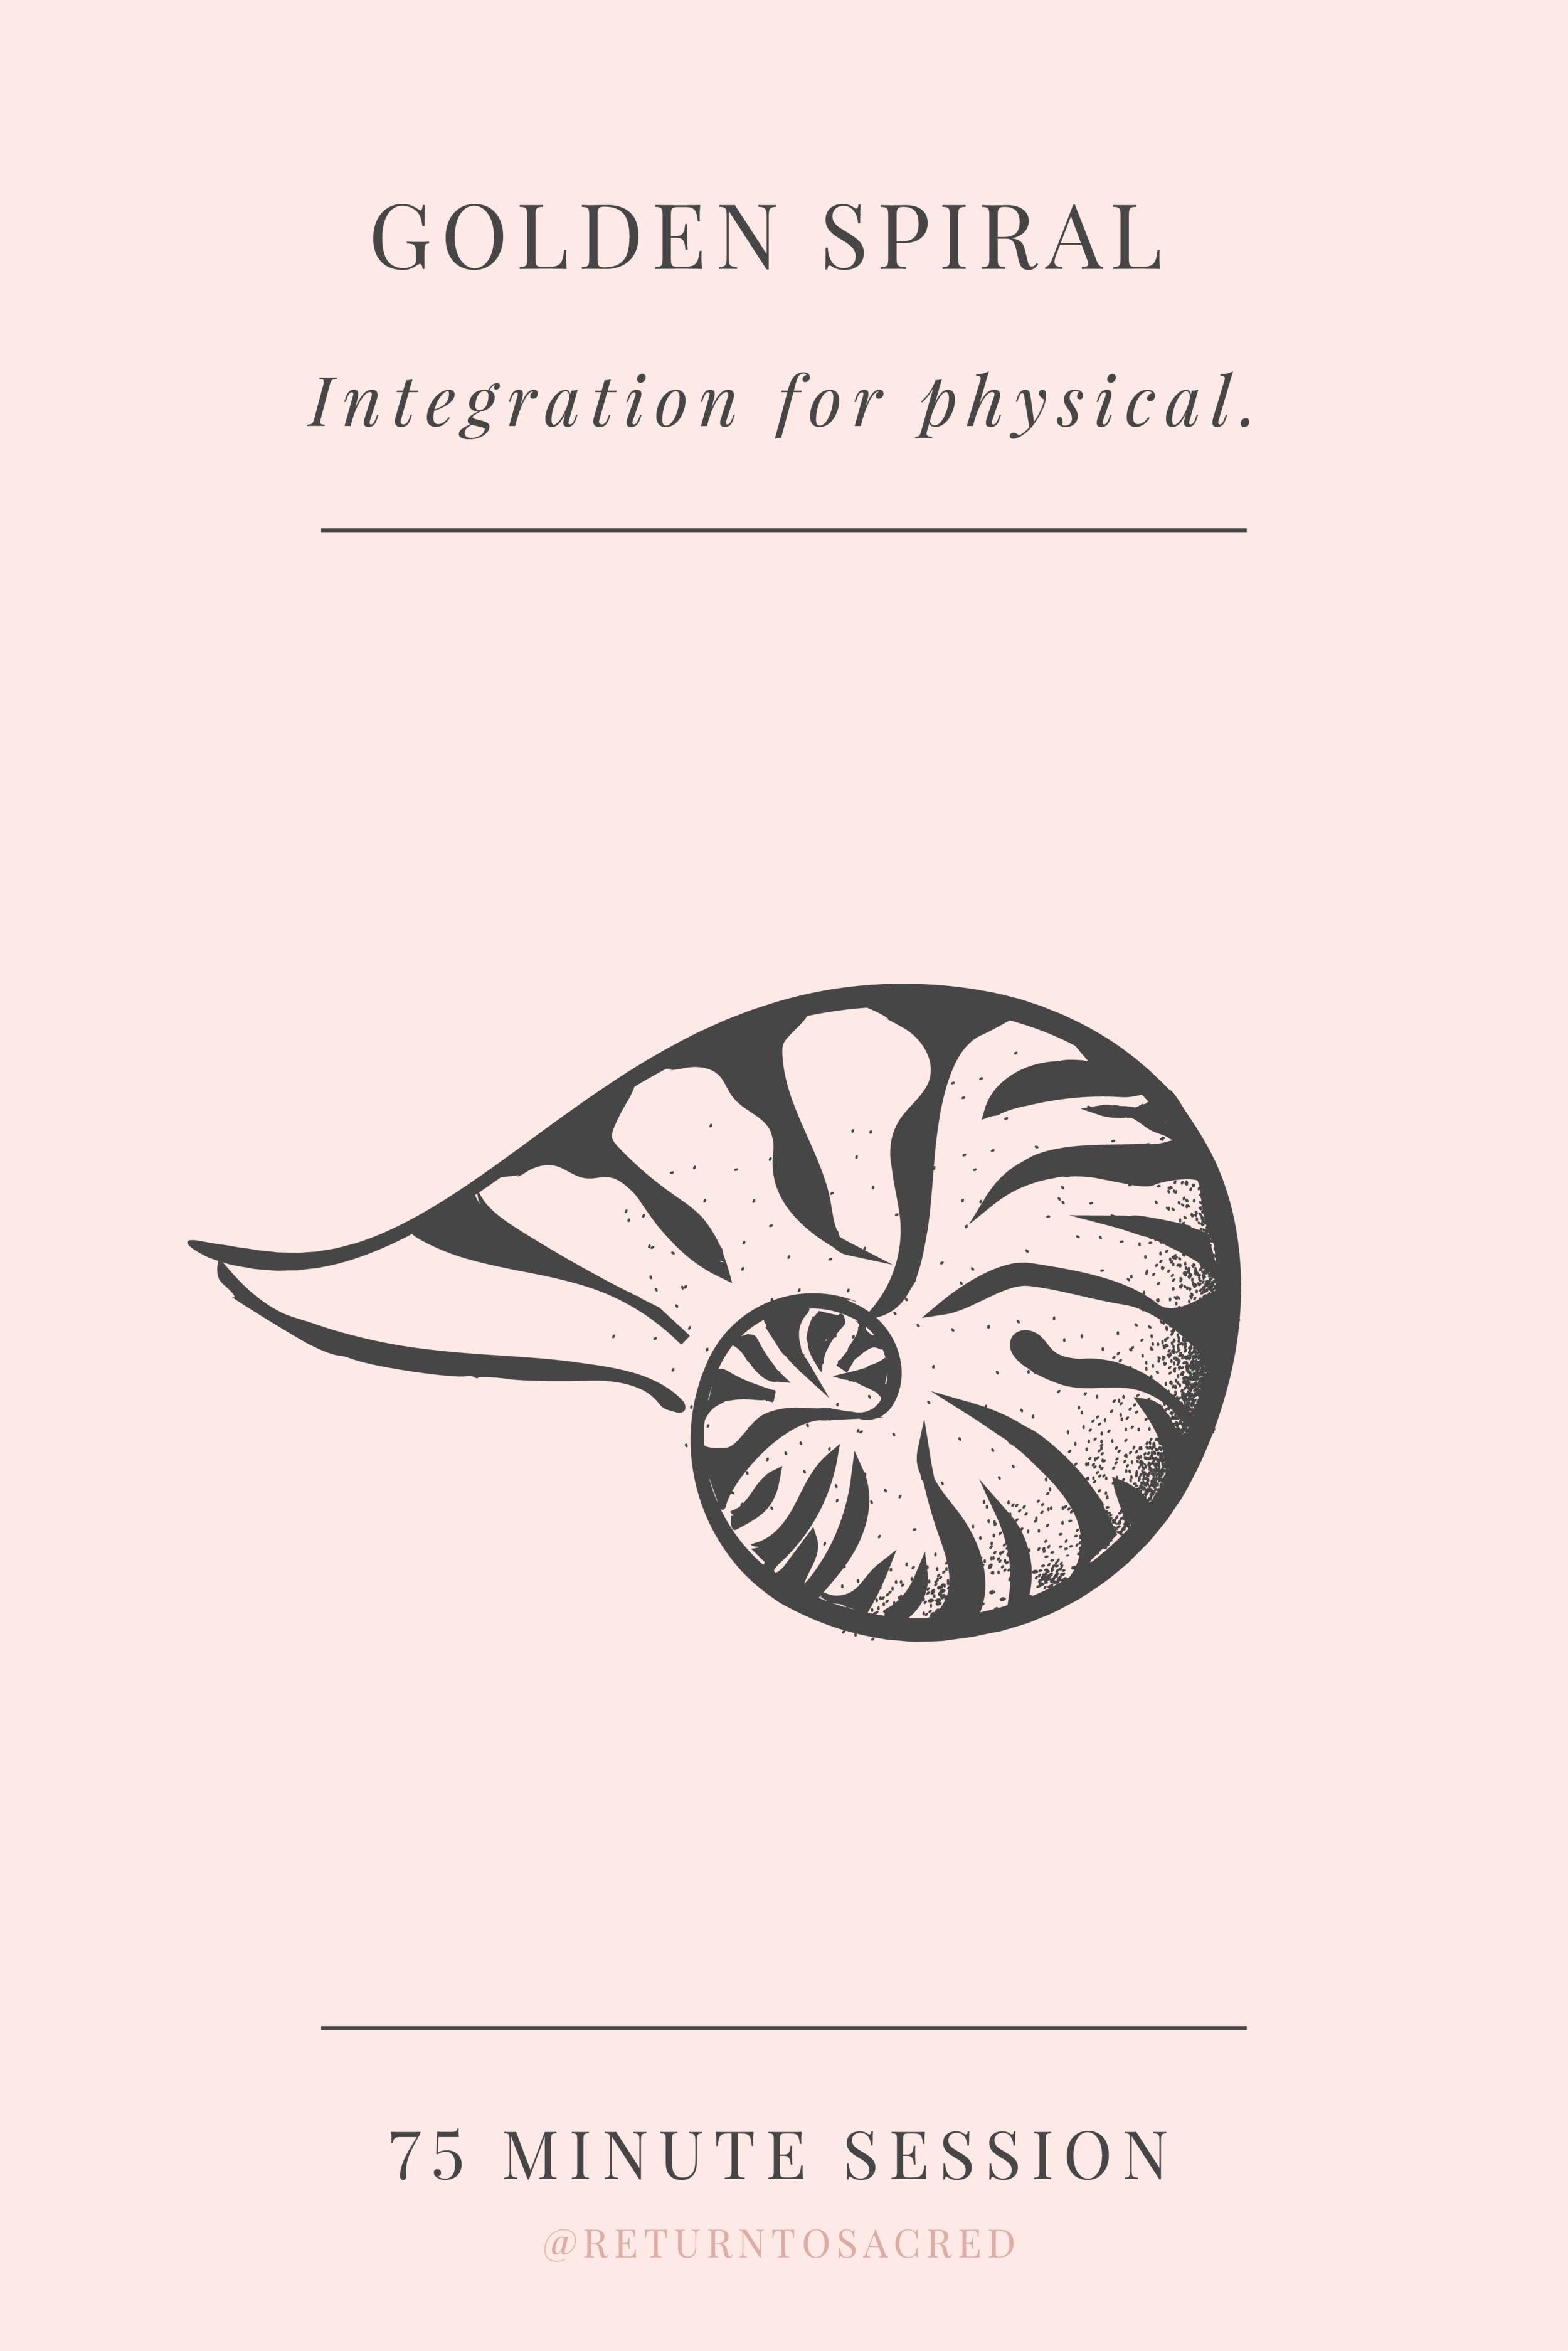 Golden-Spiral-Rectangle.png